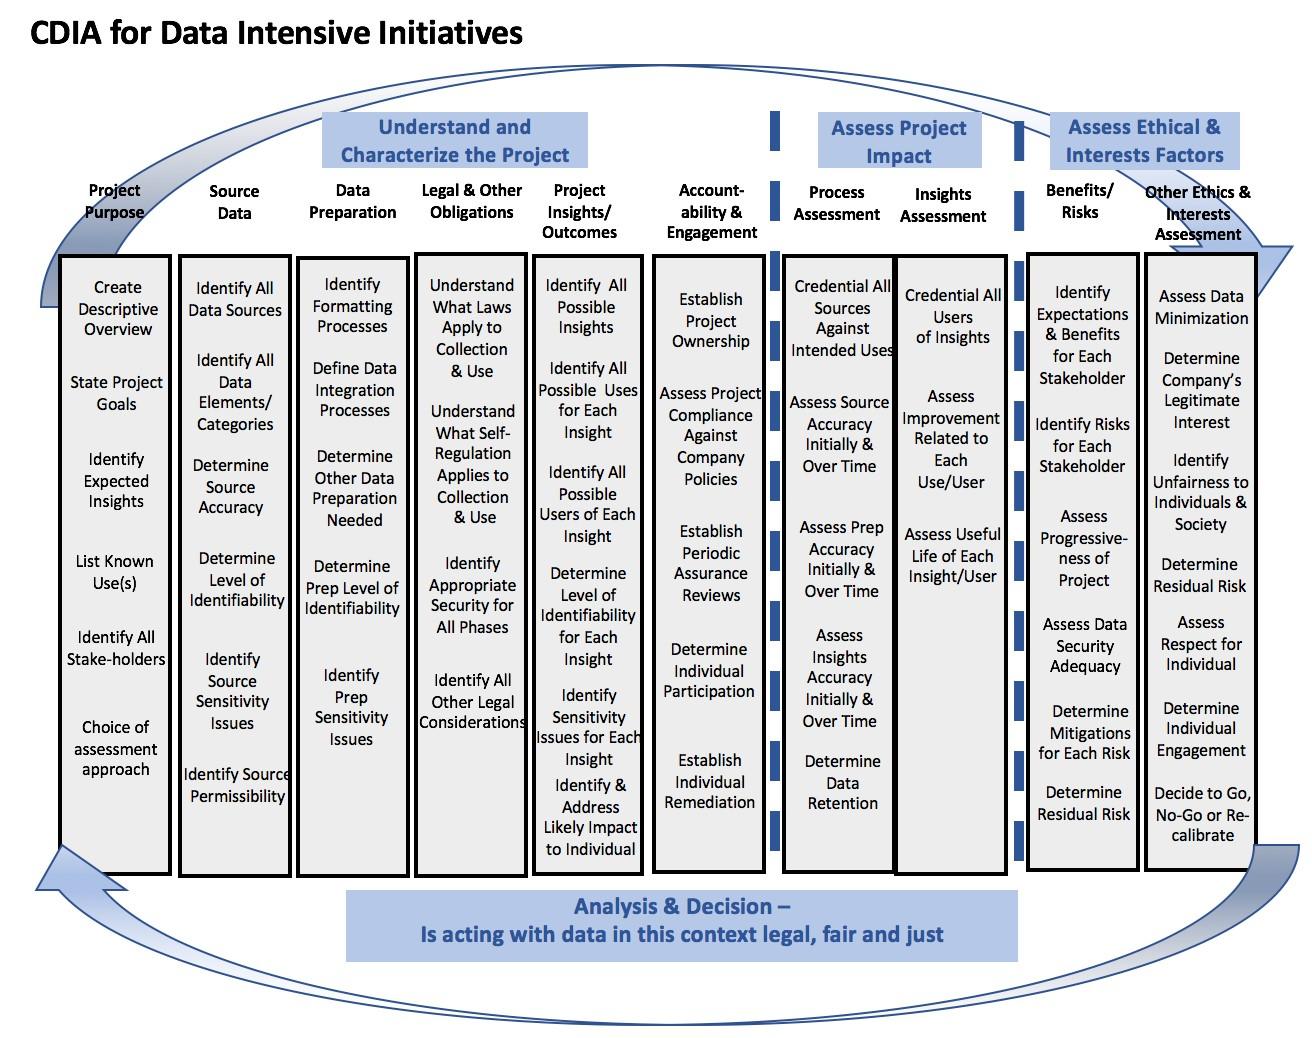 big data image 2.jpg